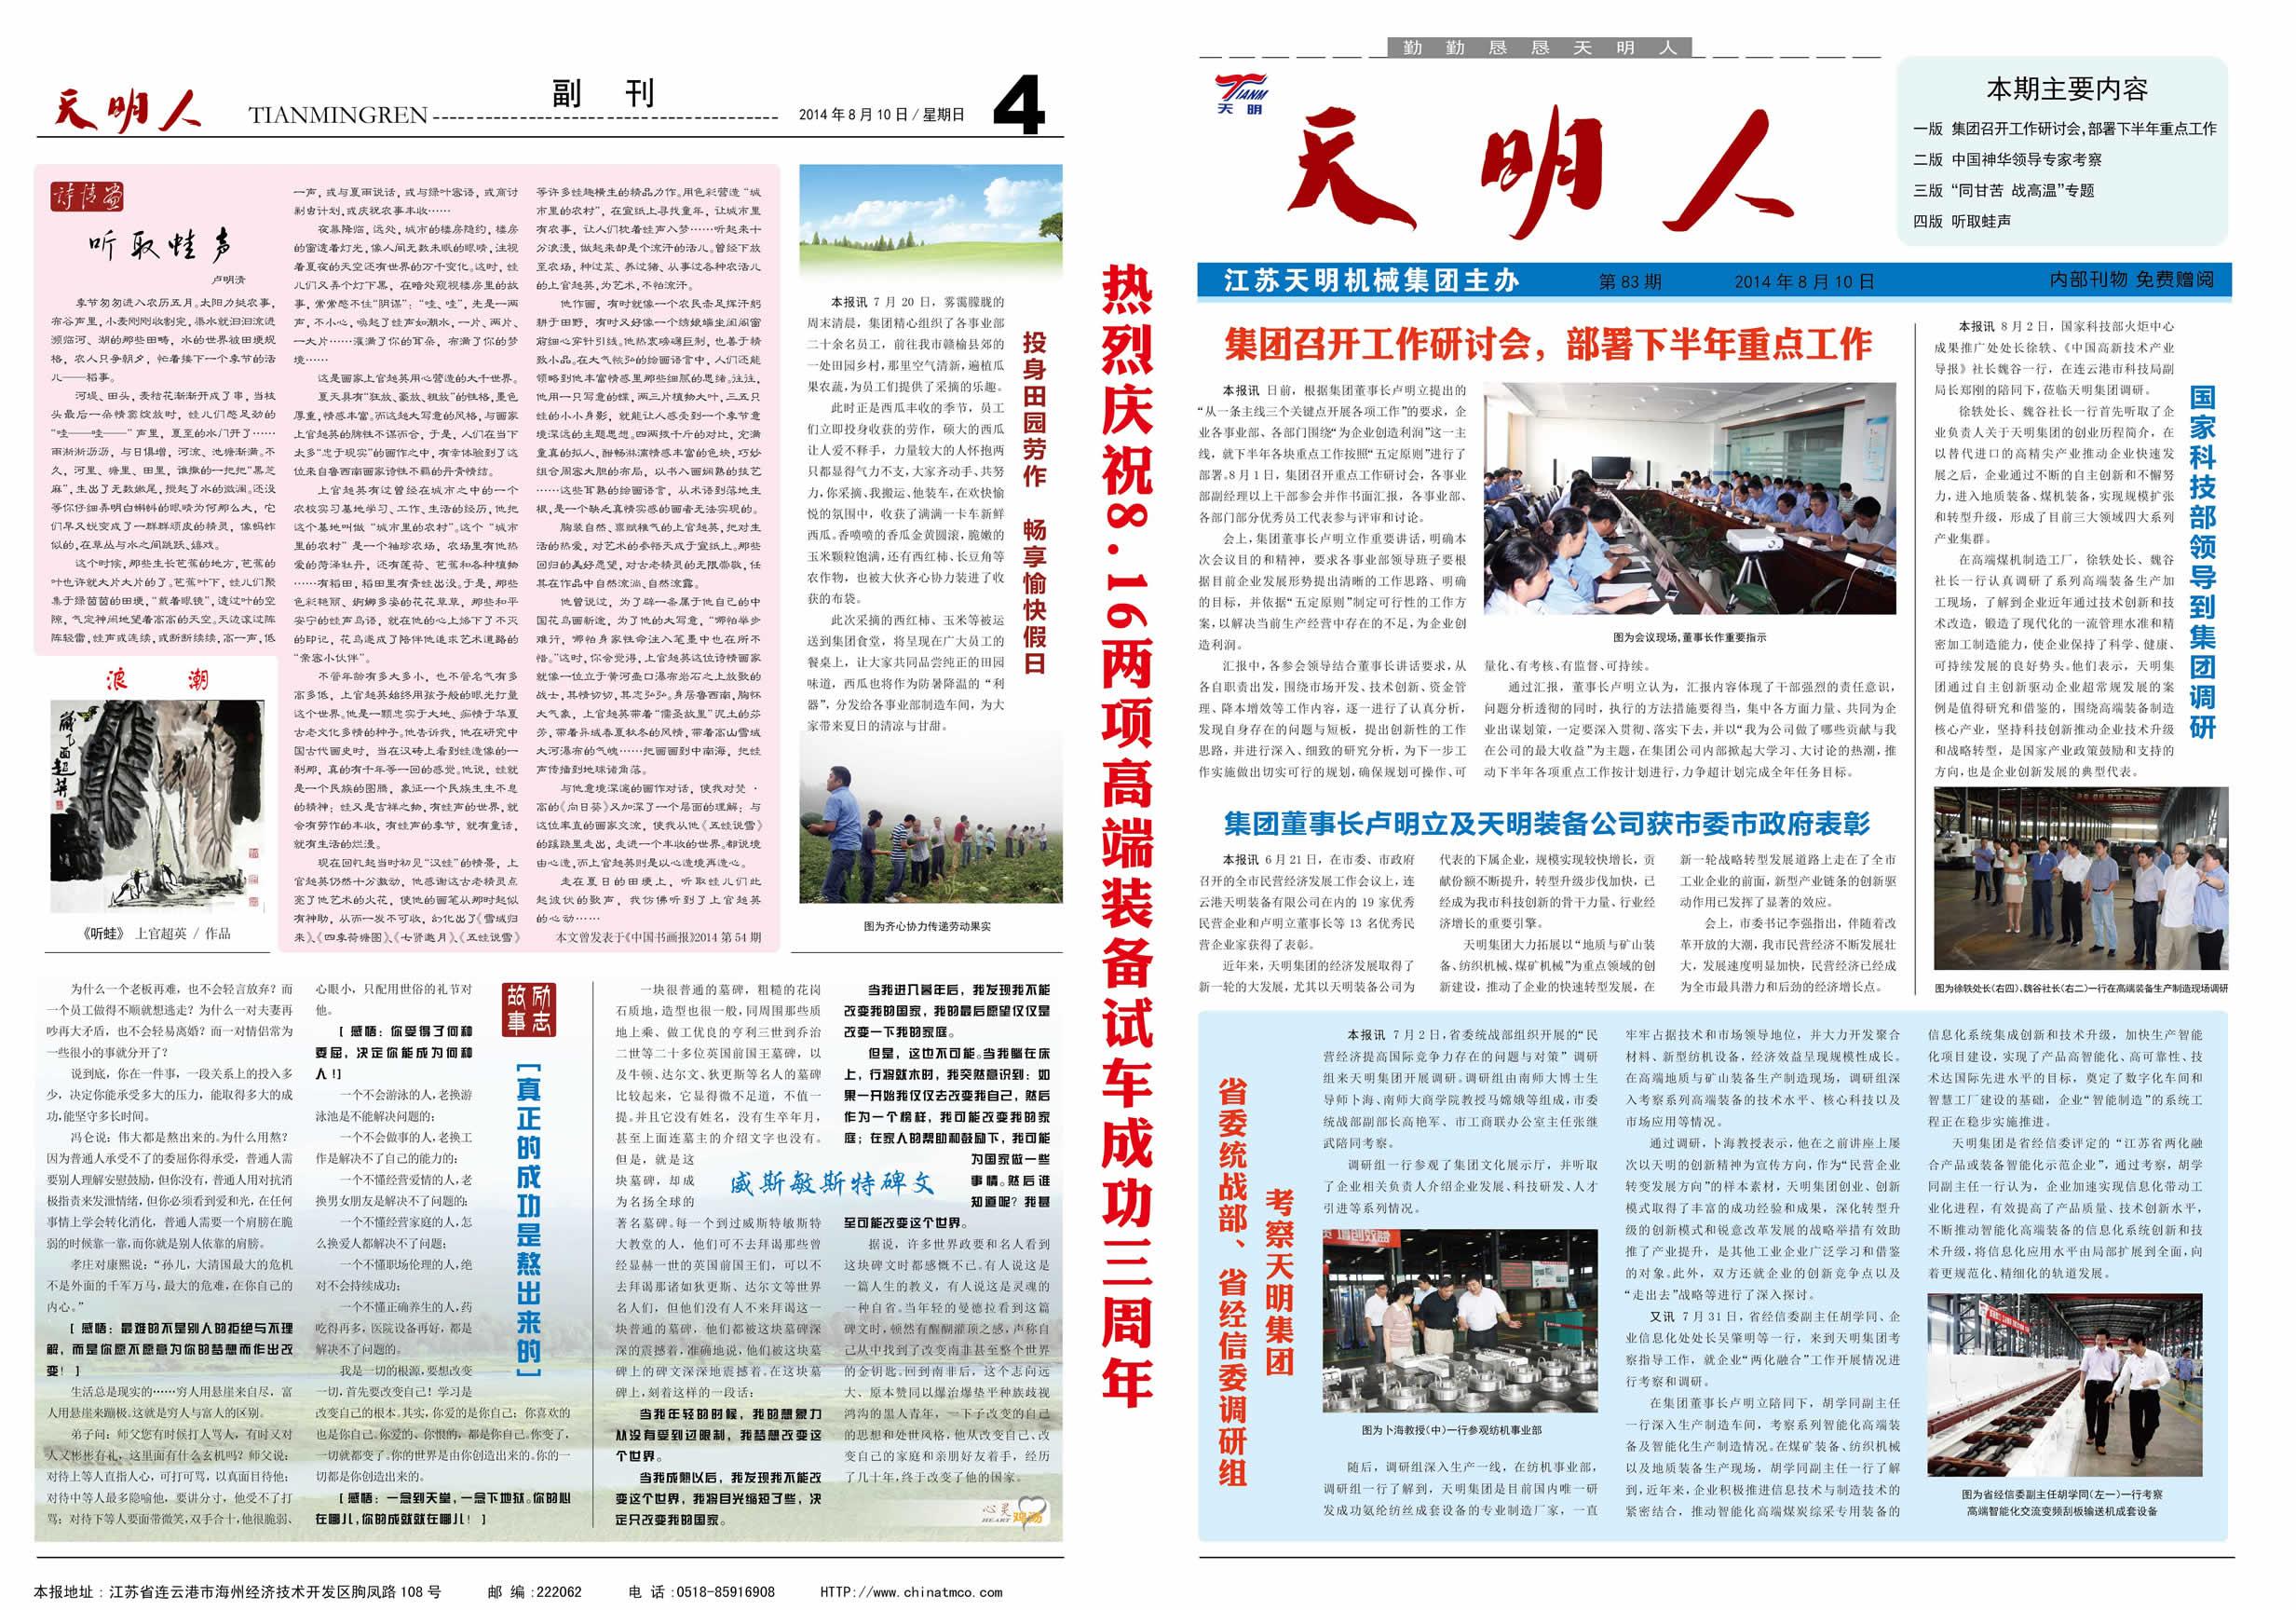 hg711皇冠国际_hg88皇冠国际平台_hg皇冠国际vip首页人2014第08期(总第83期)1、4版